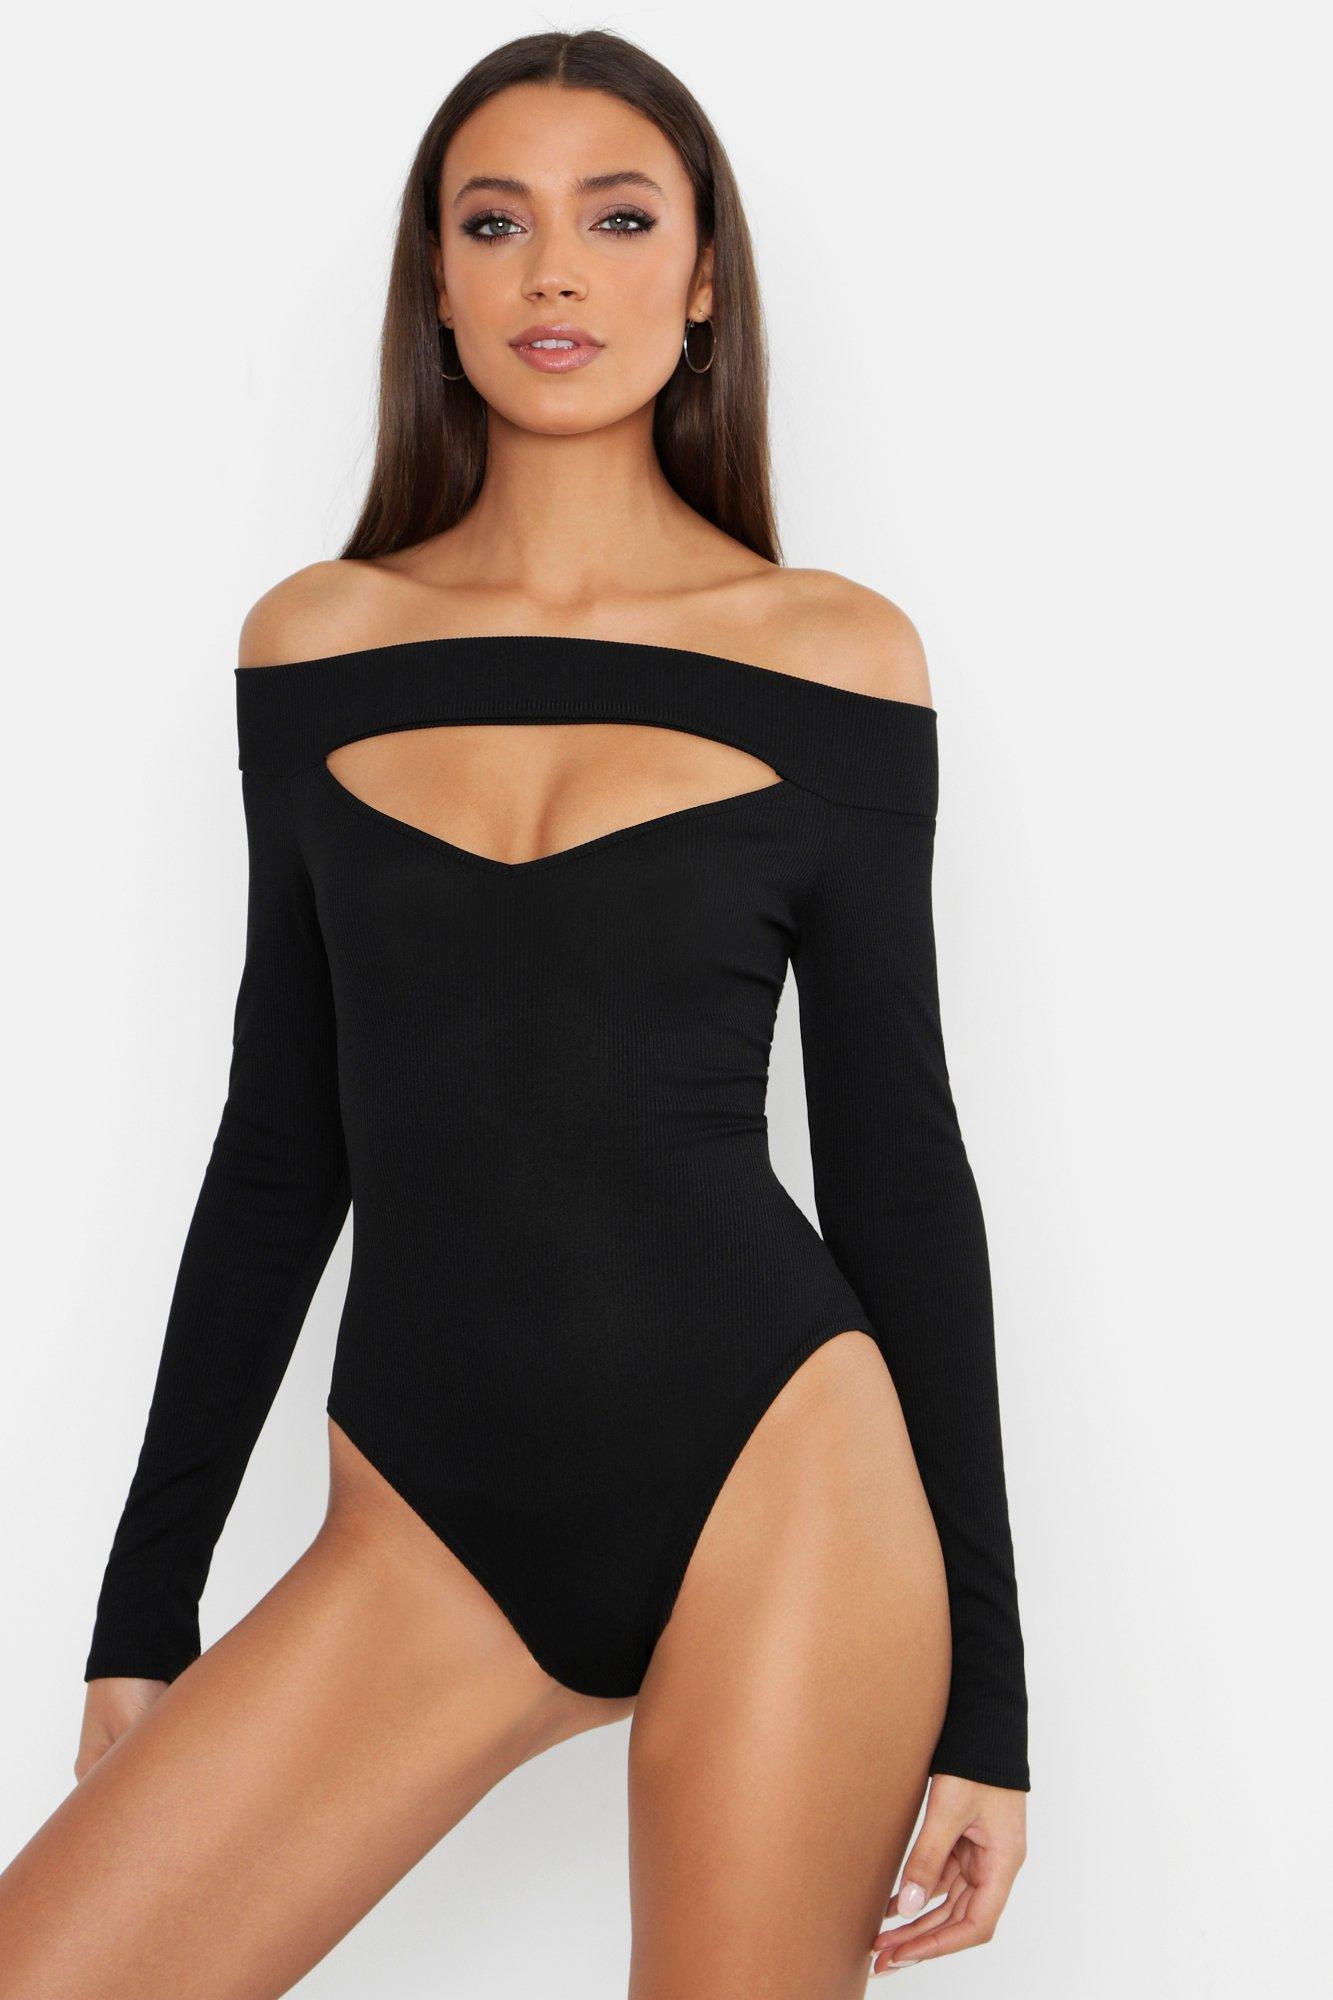 Womens Tall gerippter schulterfreier Body mit Cut-Out - schwarz - 34, Schwarz - Boohoo.com